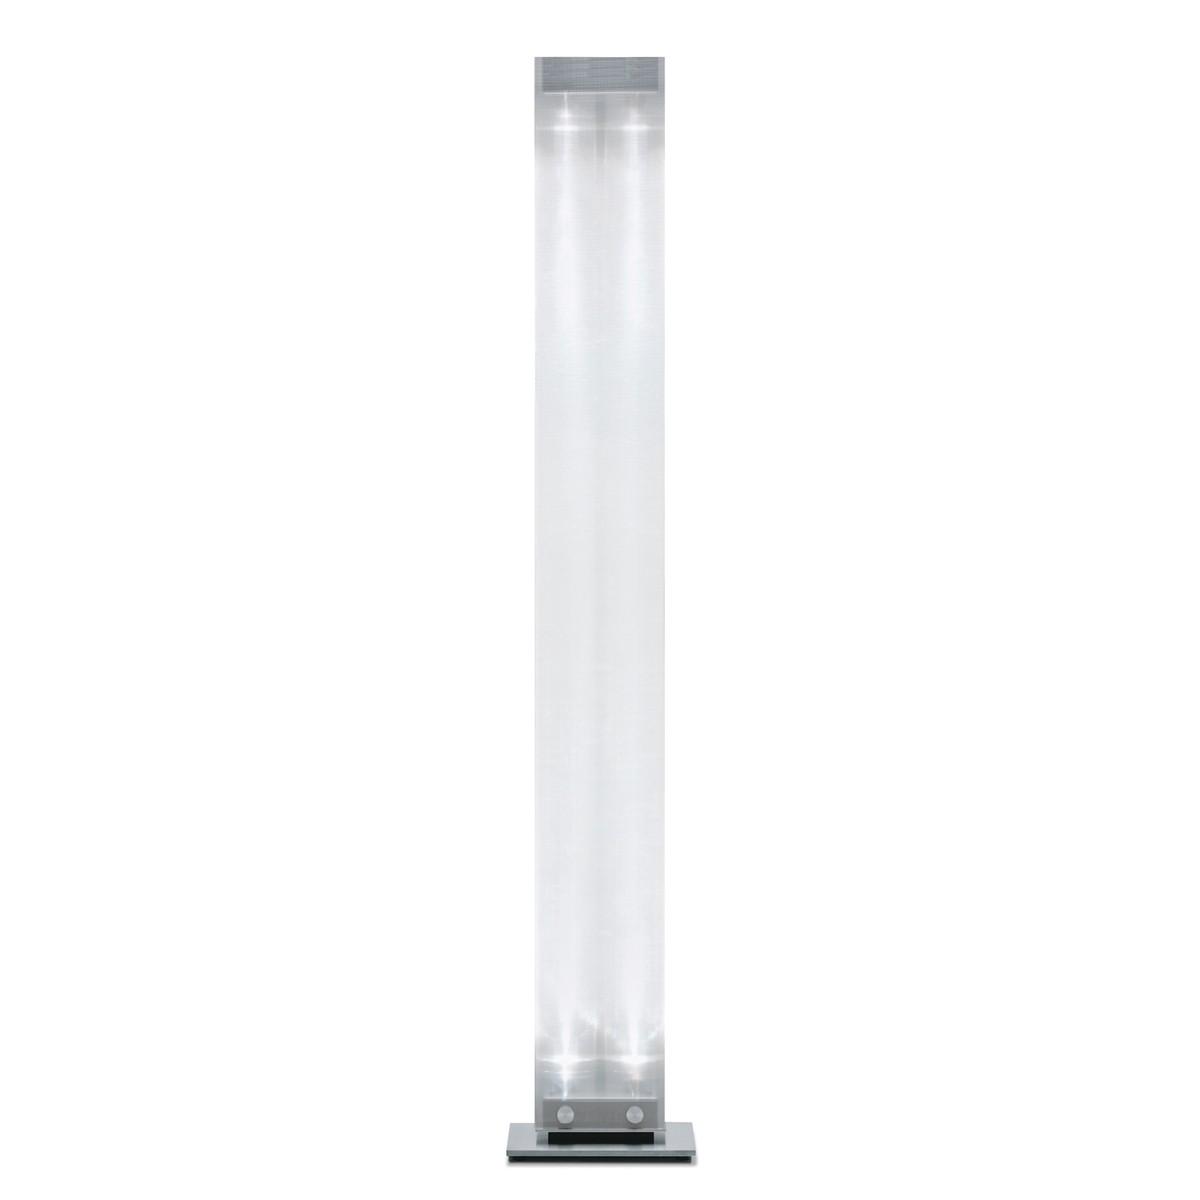 Belux Twilight-08 Stehleuchte LED, Chromstahl/Acrylglas